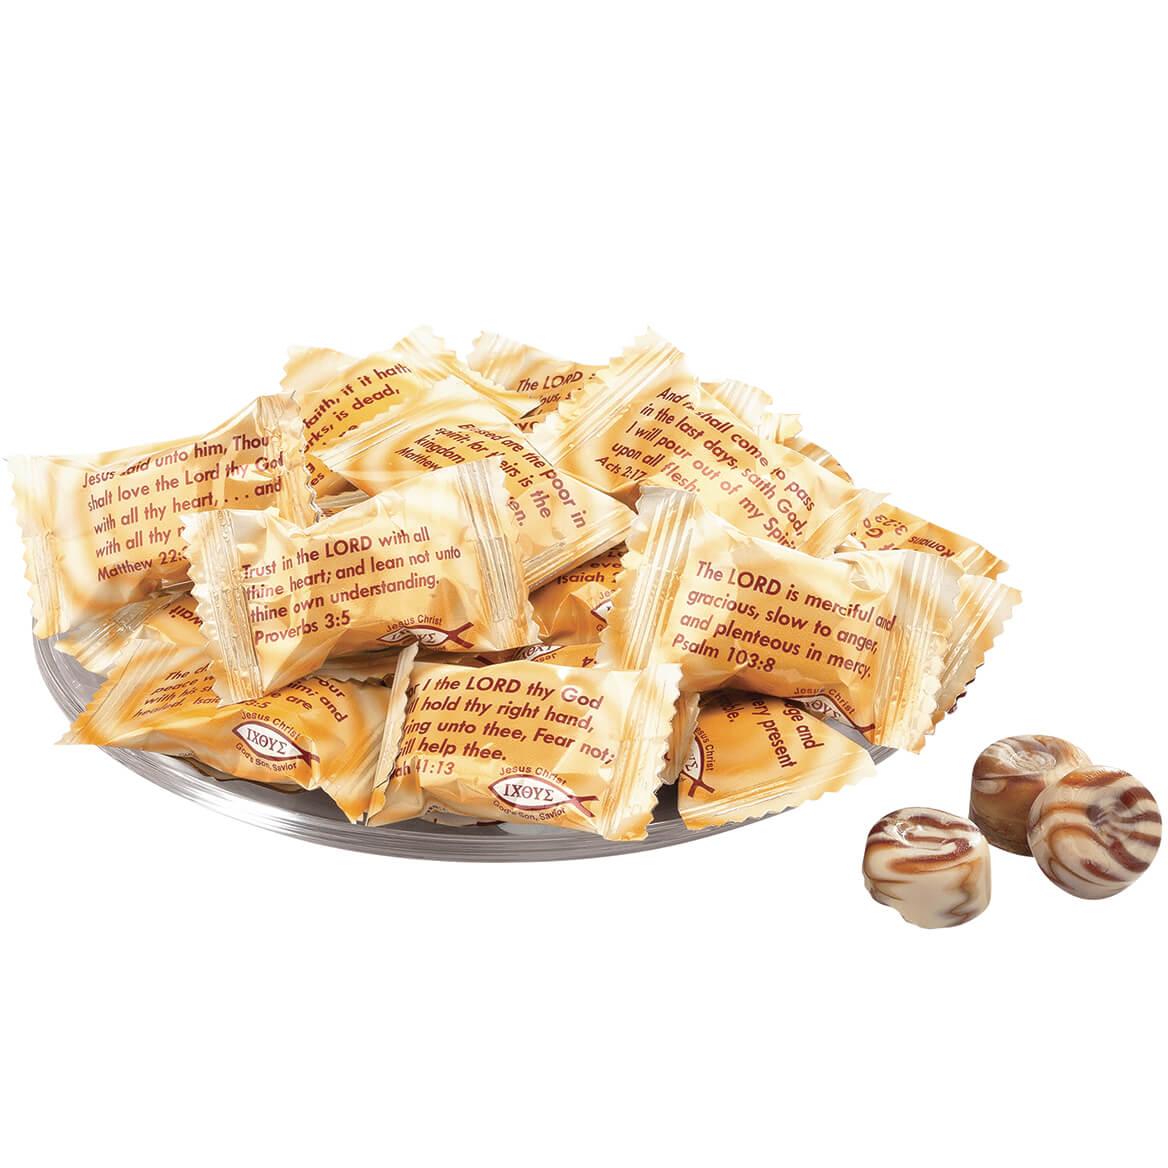 Butter & Cream Scripture Candy, 5.5 oz.-369240